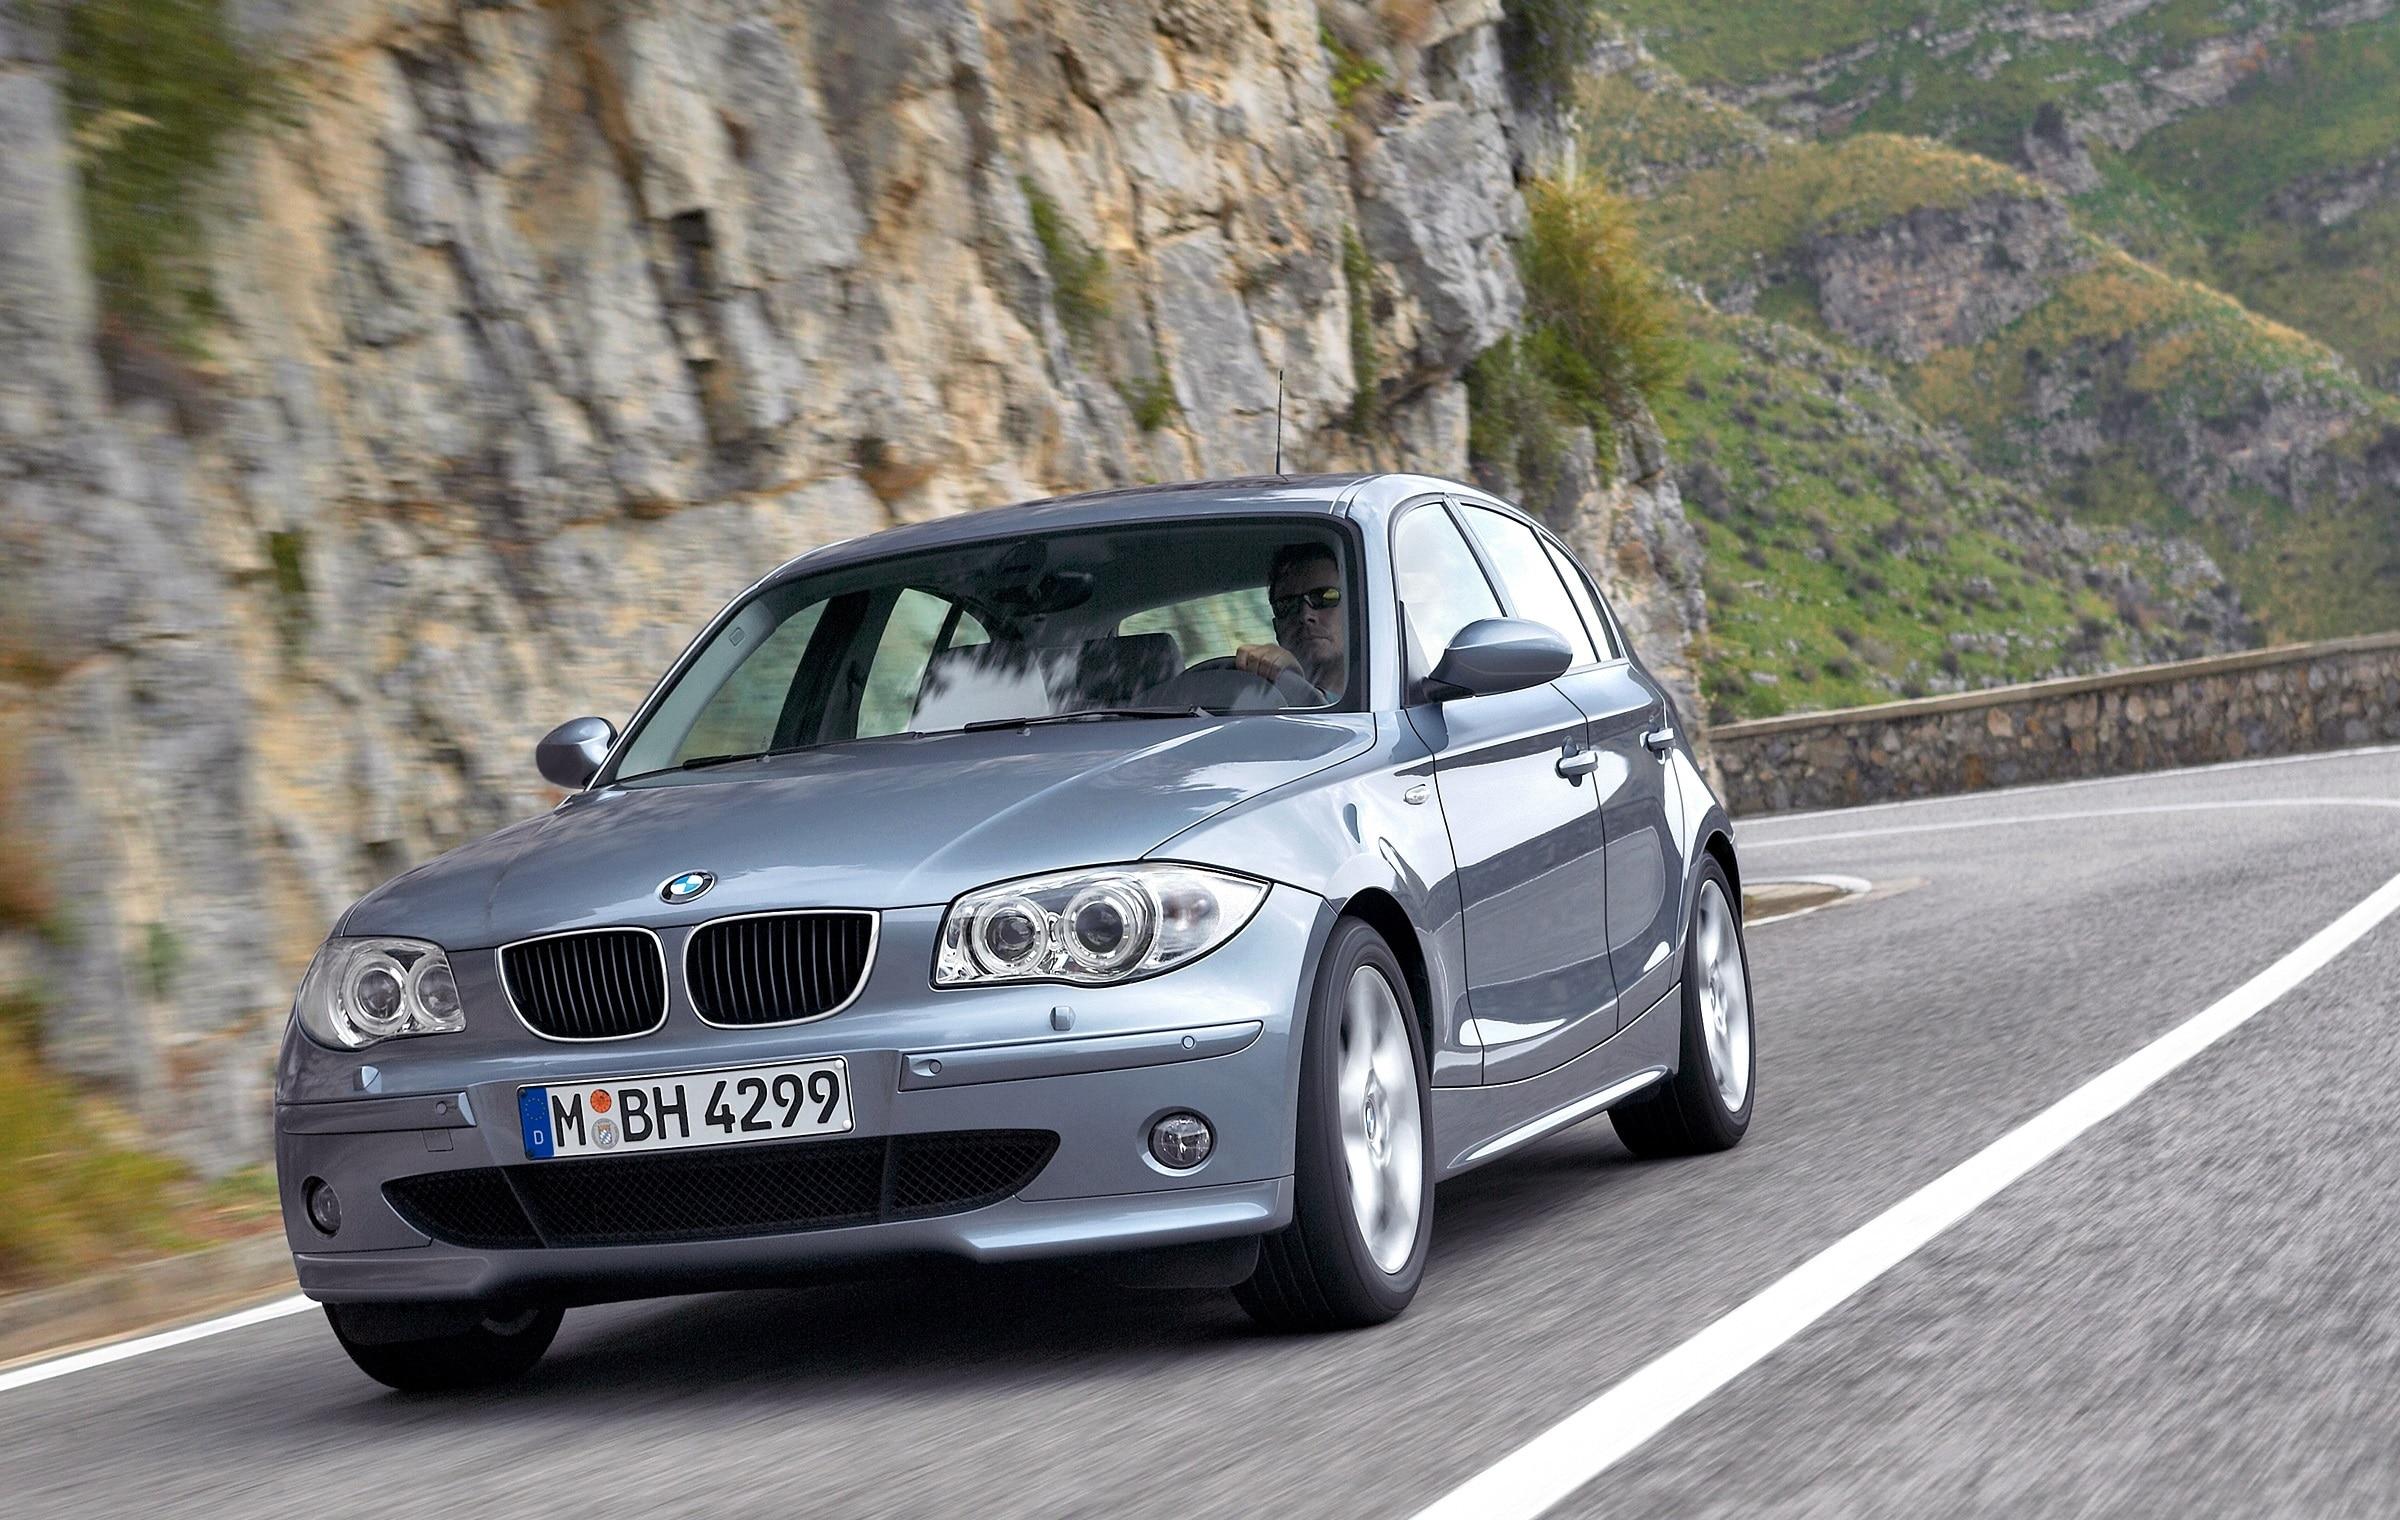 bmw 1-series, bmw, 1-series, 116i, 118i, 120i, ultimate driving machine, 130i, m sport, bmw m sport, german, german car, motoring, automotive, cars, car, autotrader, ebay, car sales, cheap car, not2grand